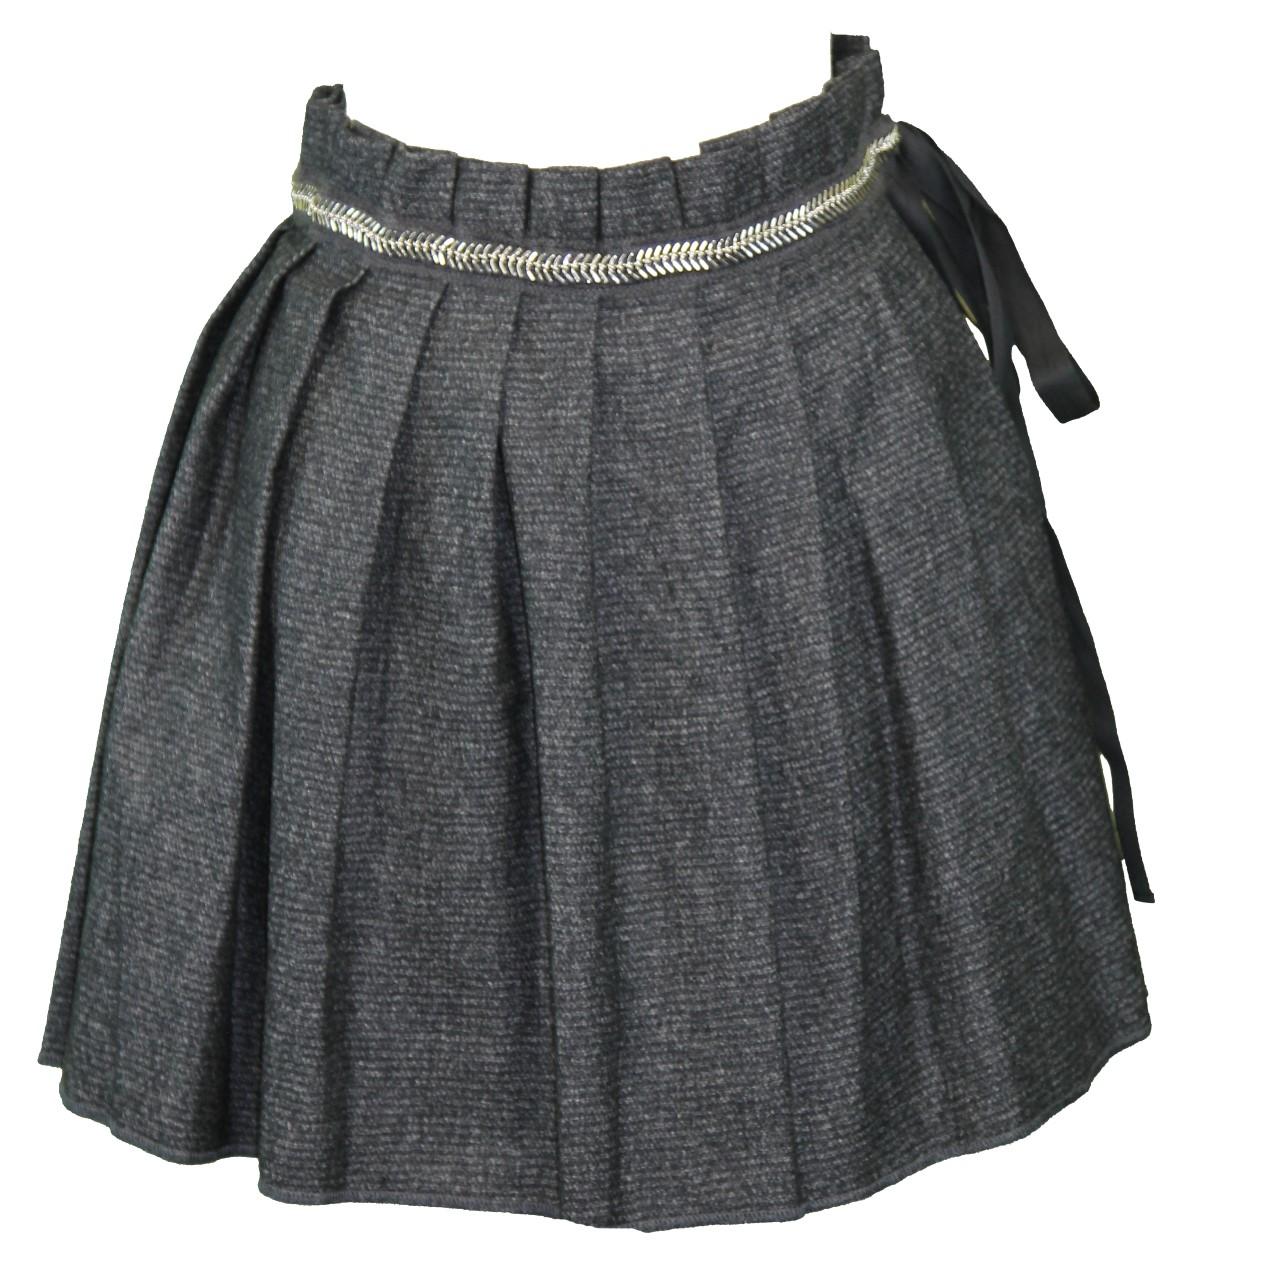 DANIELE ALESSANDRINI Womens Charcoal Pleated Wool Blnd Mini Skirt IT 44 NWT by